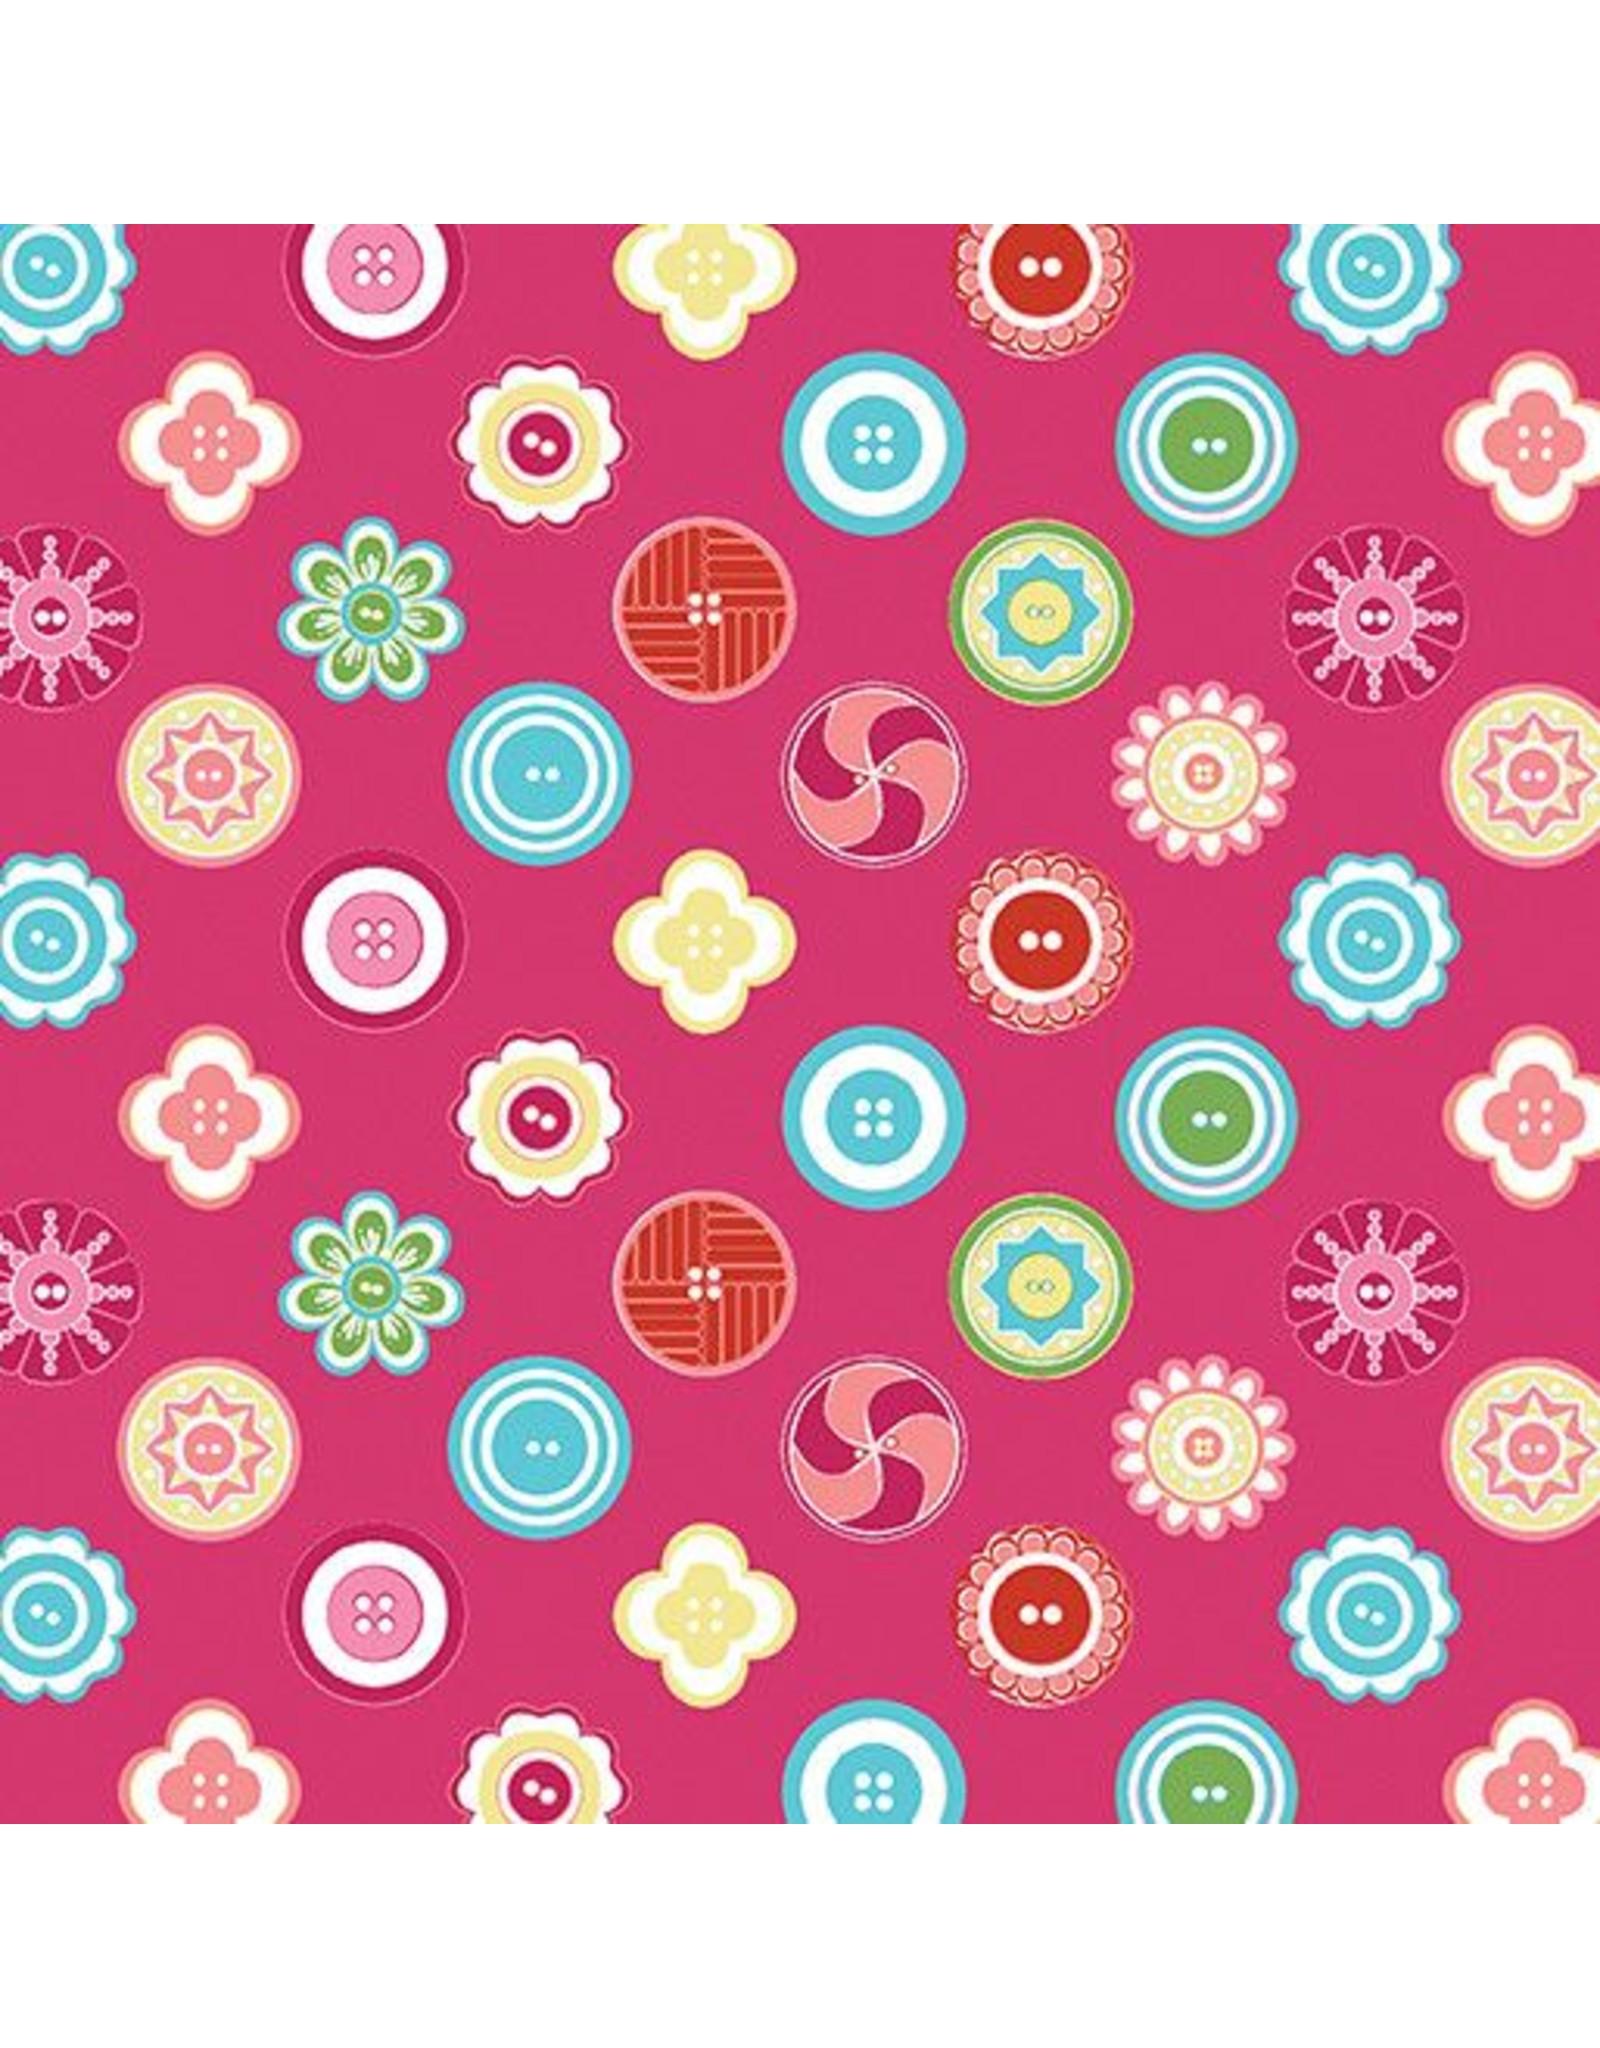 Contempo My Happy Place - Squared Buttons Fuchsia